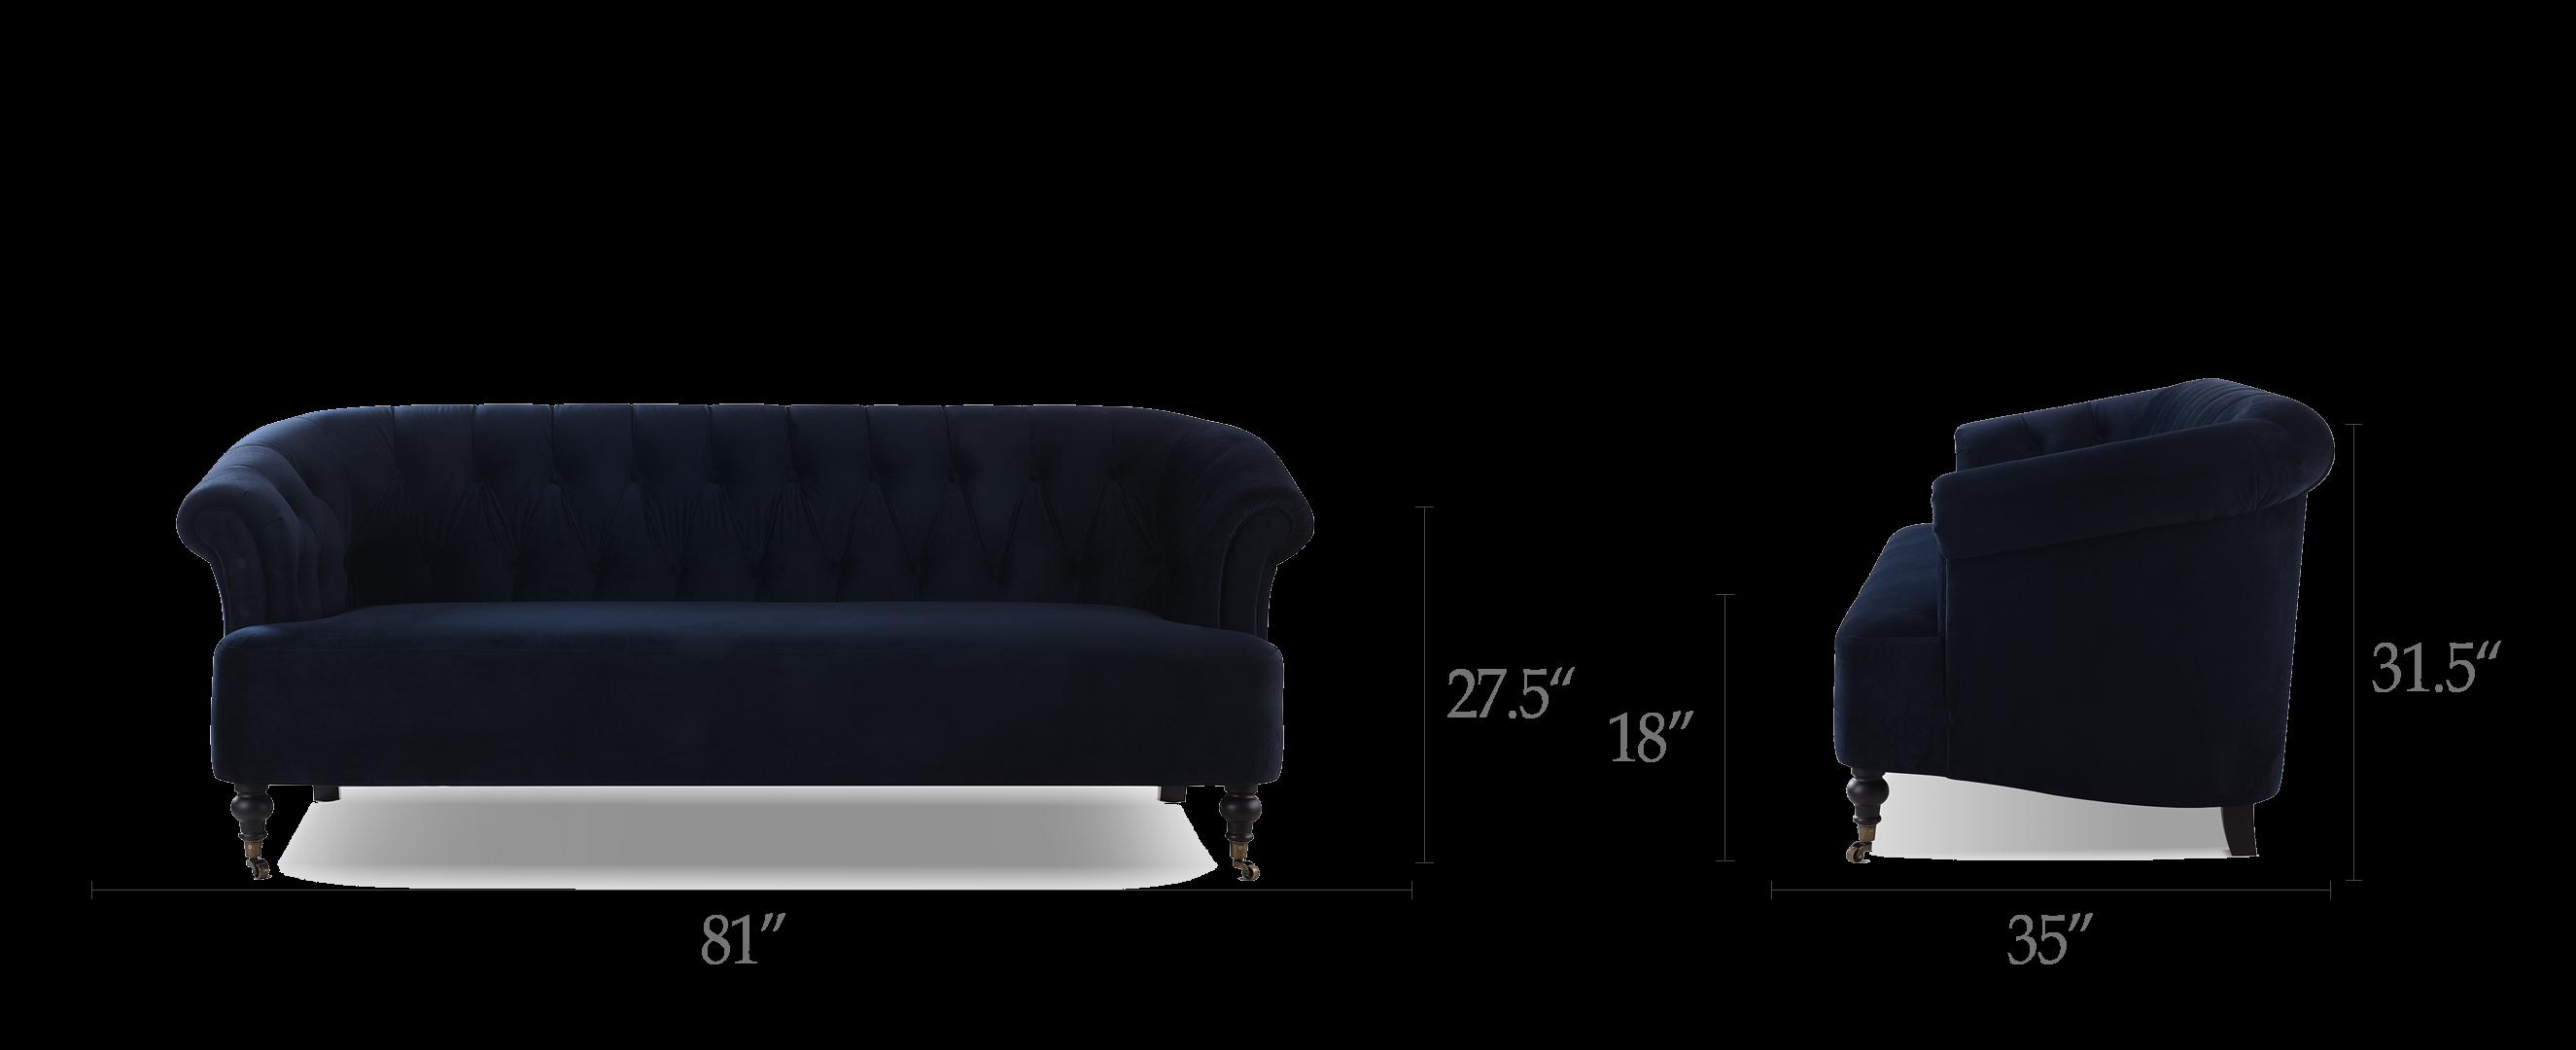 Maxine Tufted Upholstered Sofa